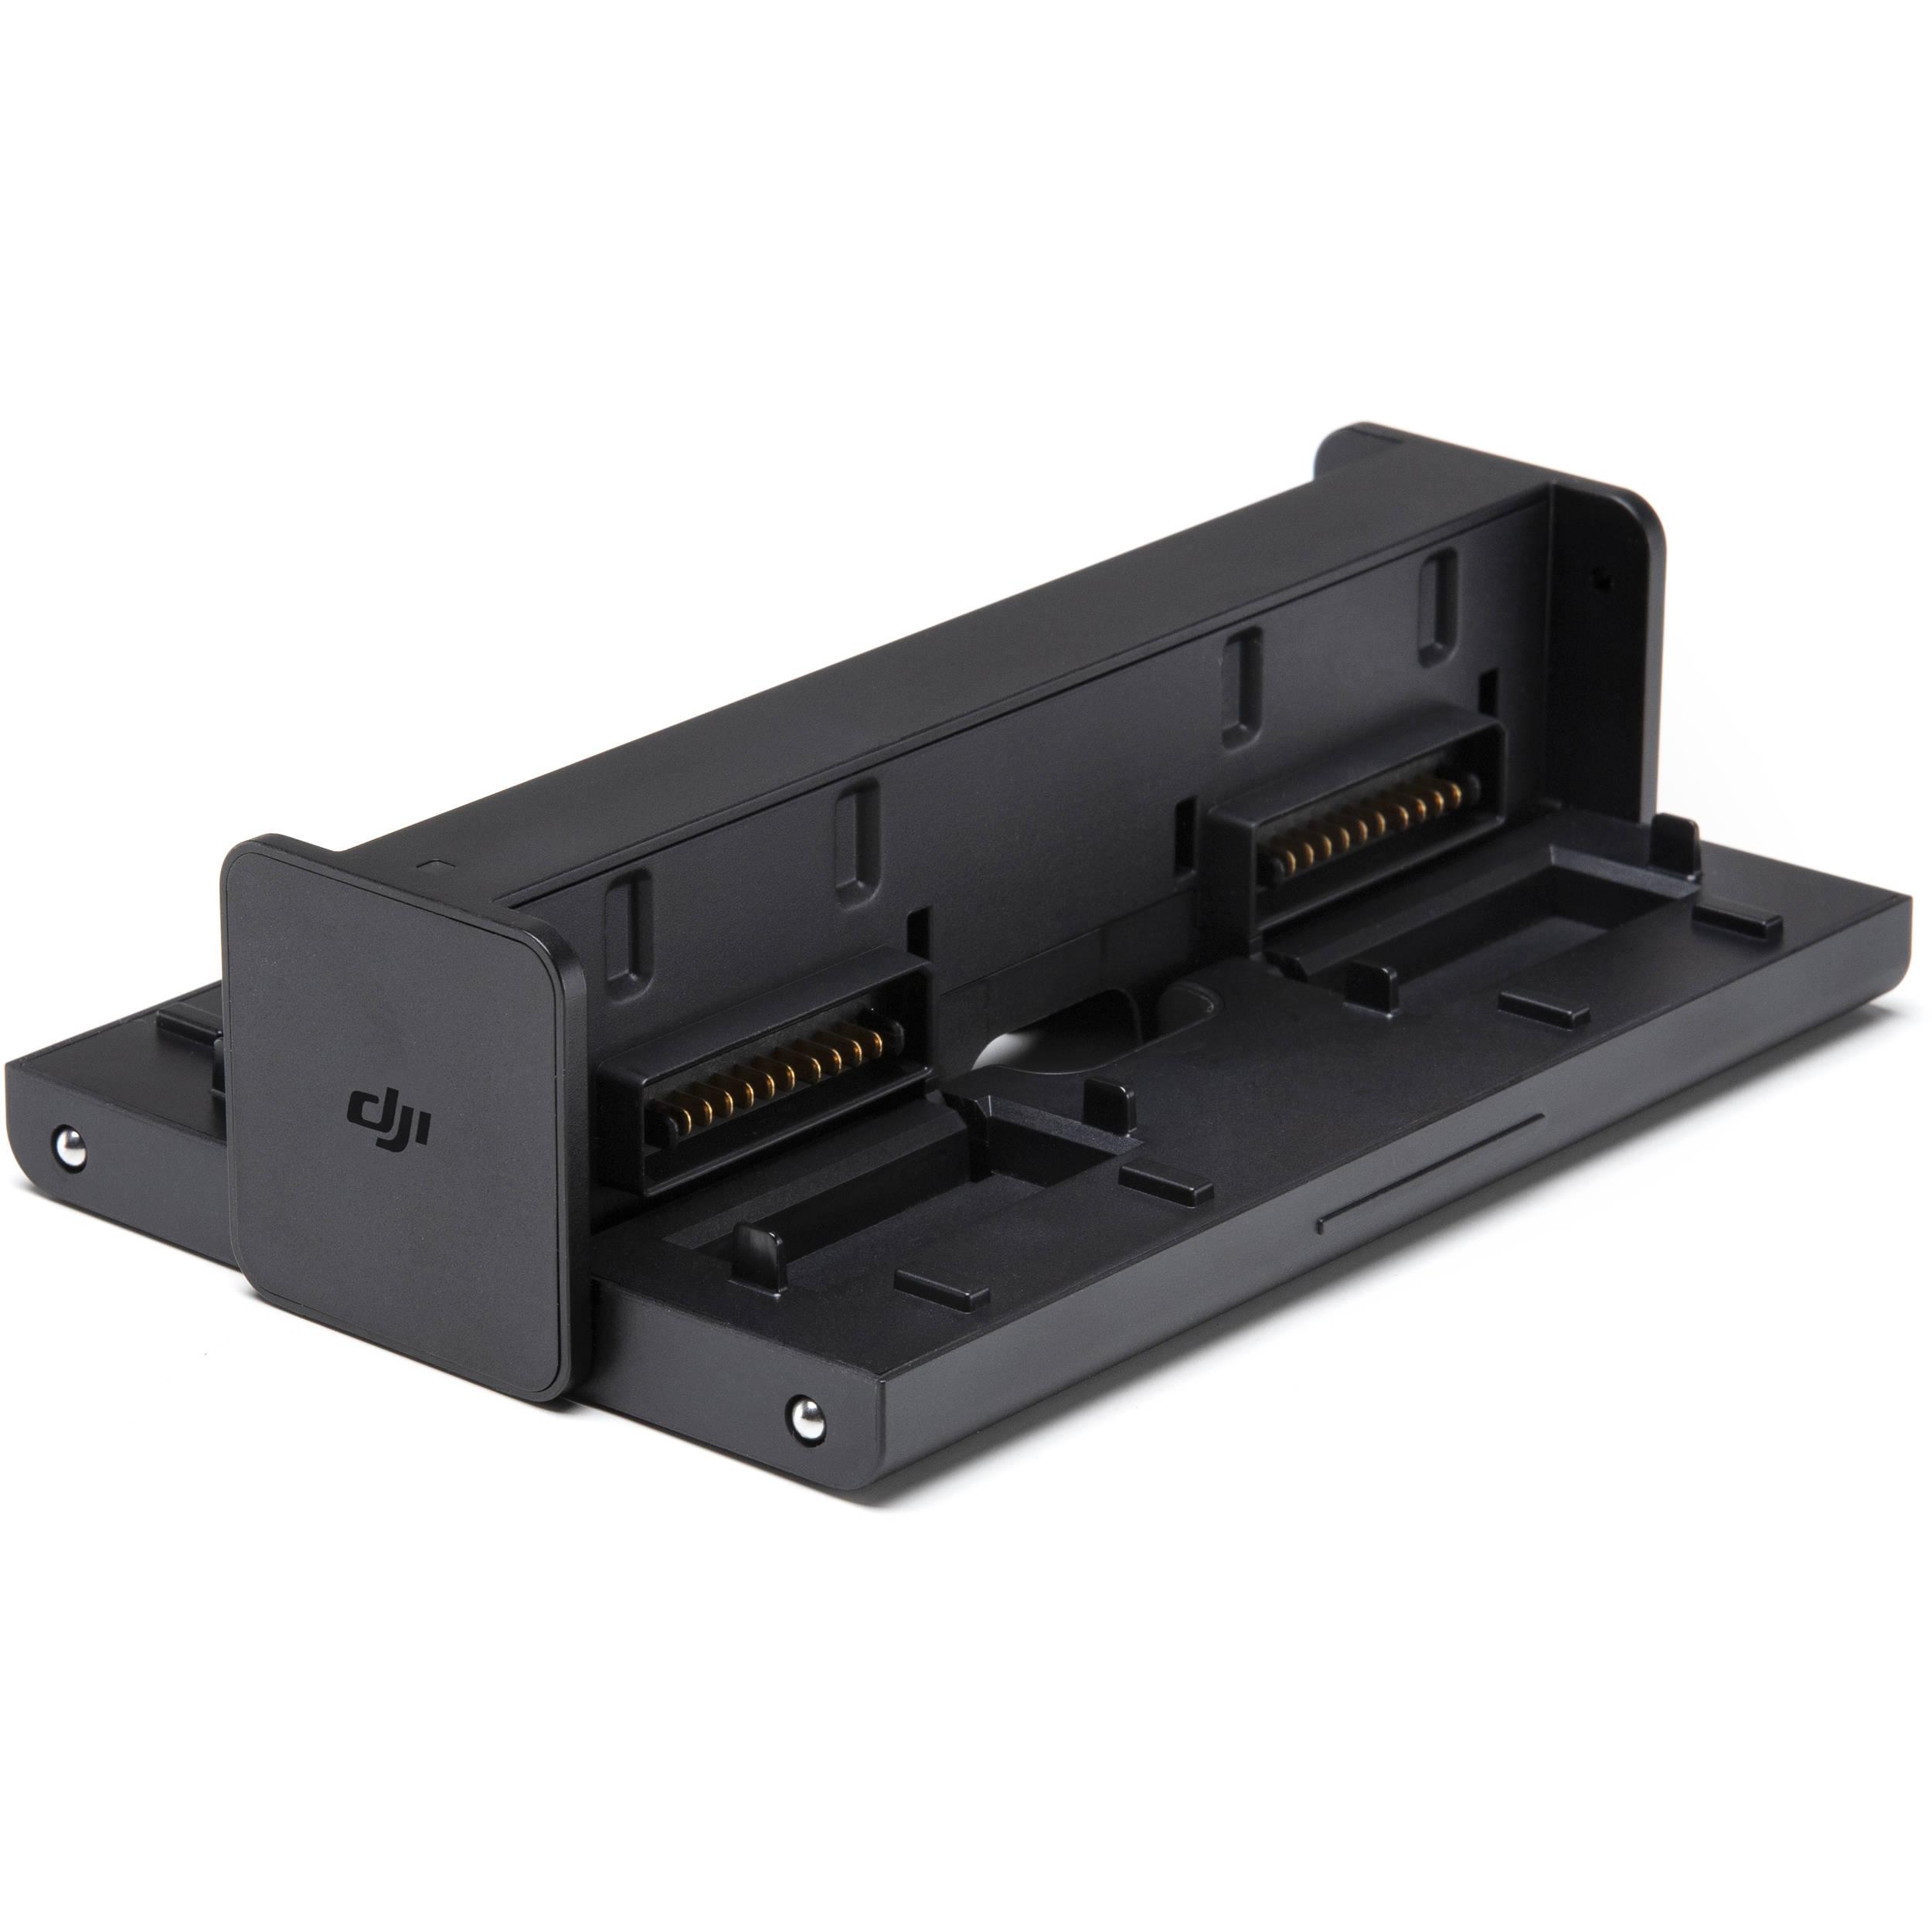 Dji Battery Charging Hub For Mavic 2 Pro Zoom Cpma0000005601 Phantom 4 Batteries